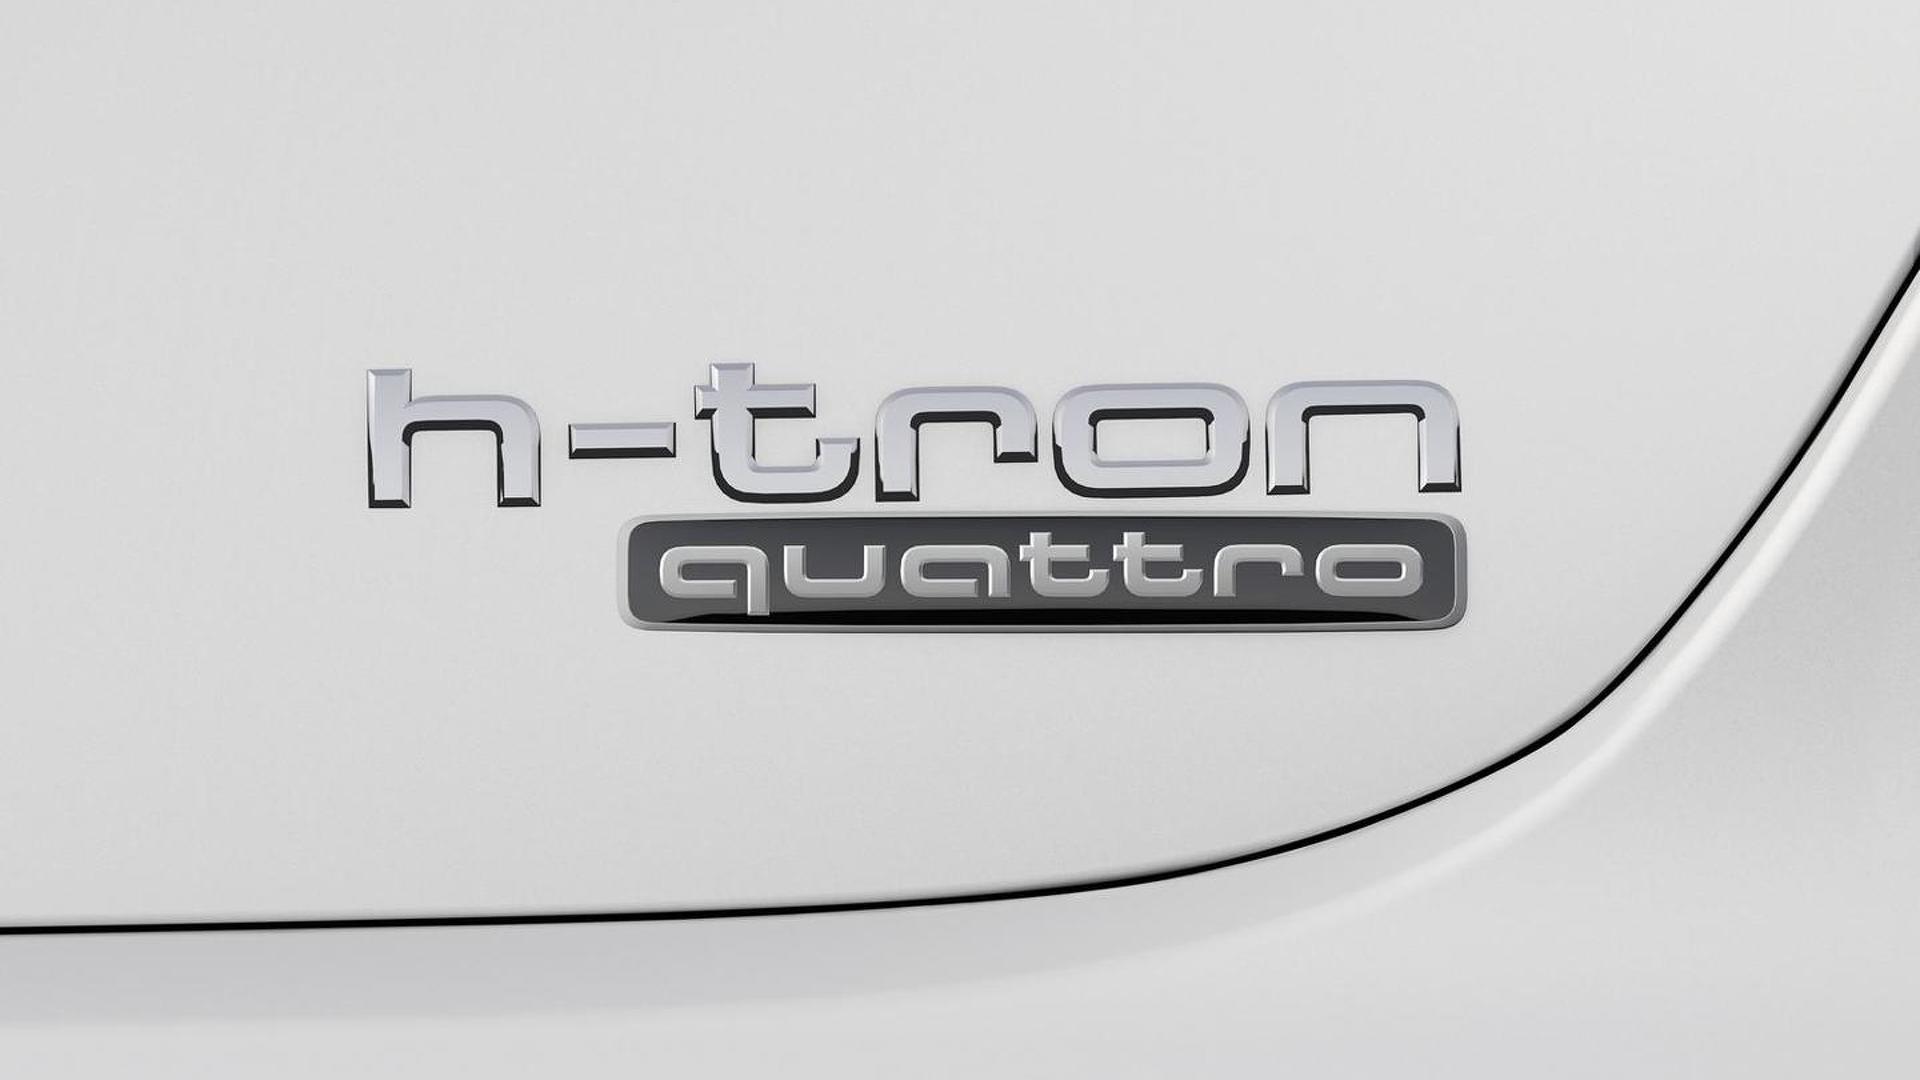 Надпись h-tron quattro на крышке багажника Audi A7